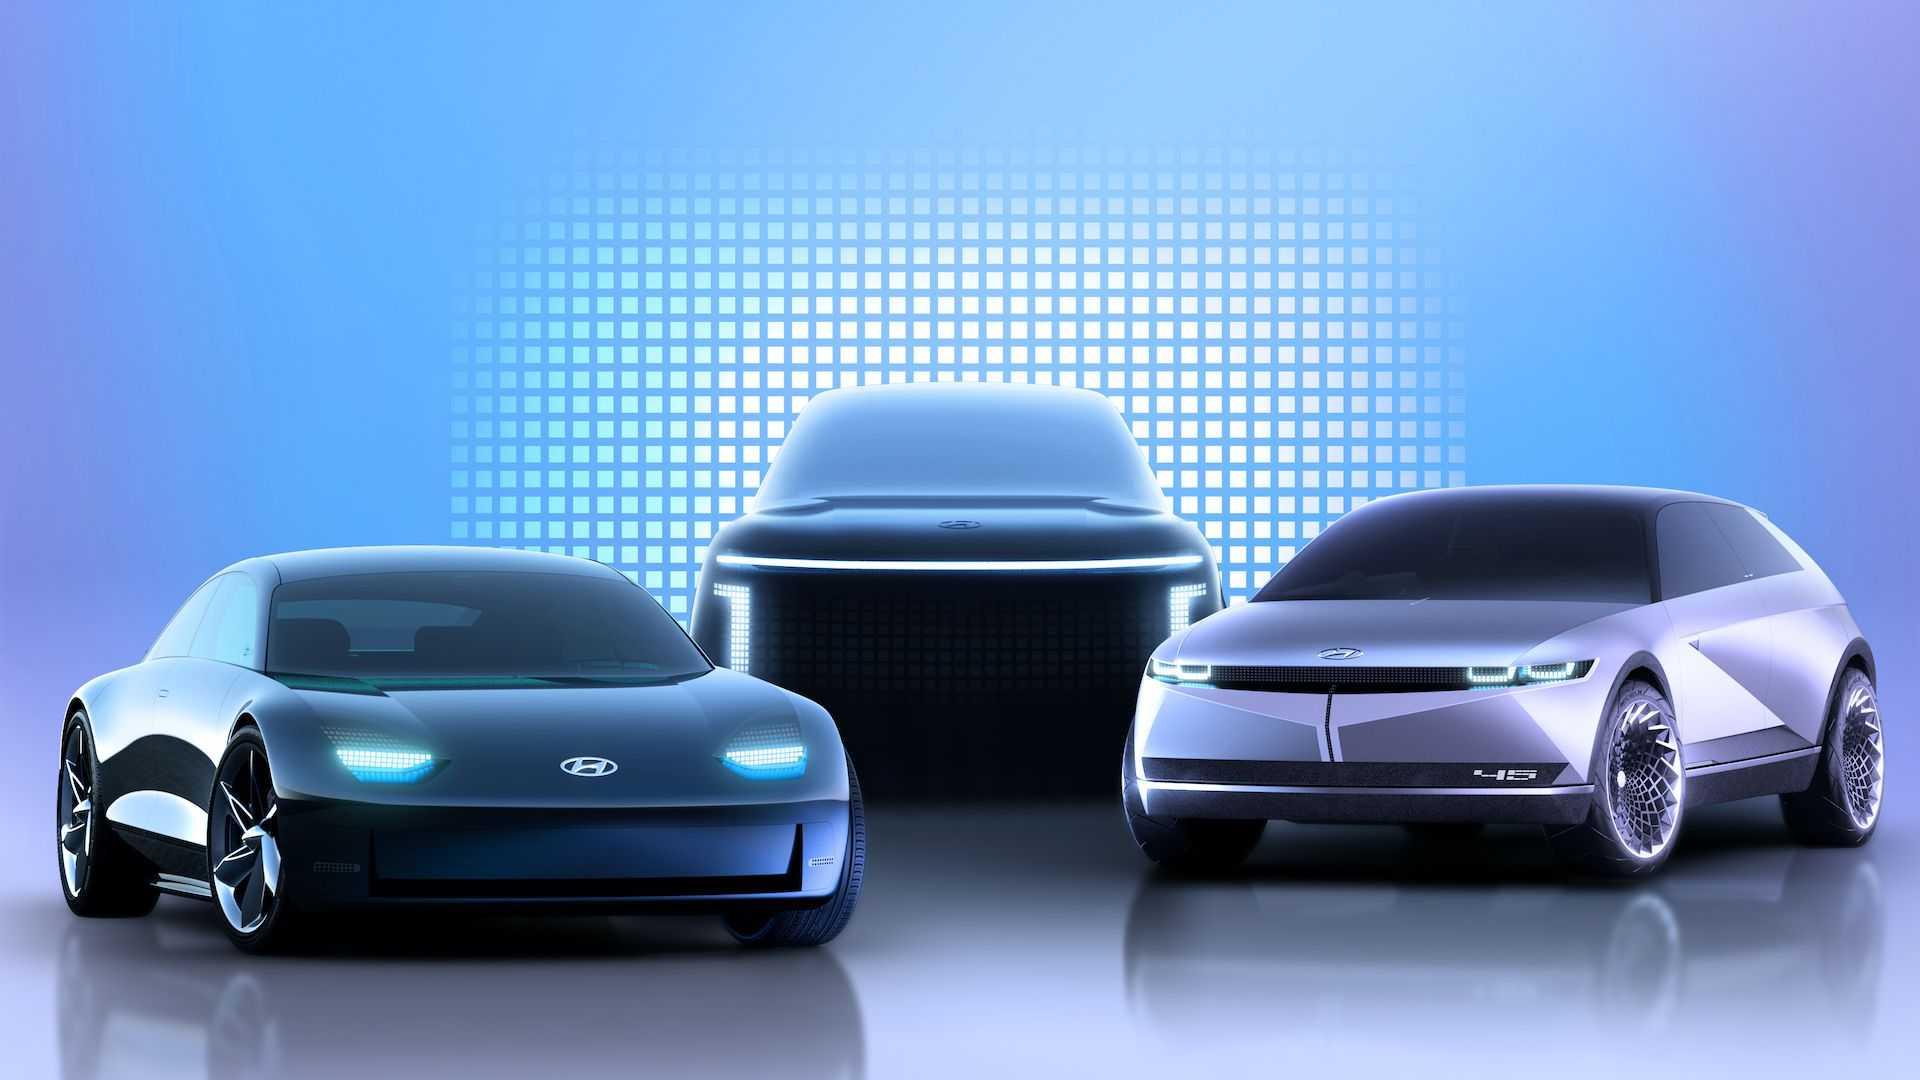 IONIQ成为现代旗下子品牌 将推出三款纯电动汽车